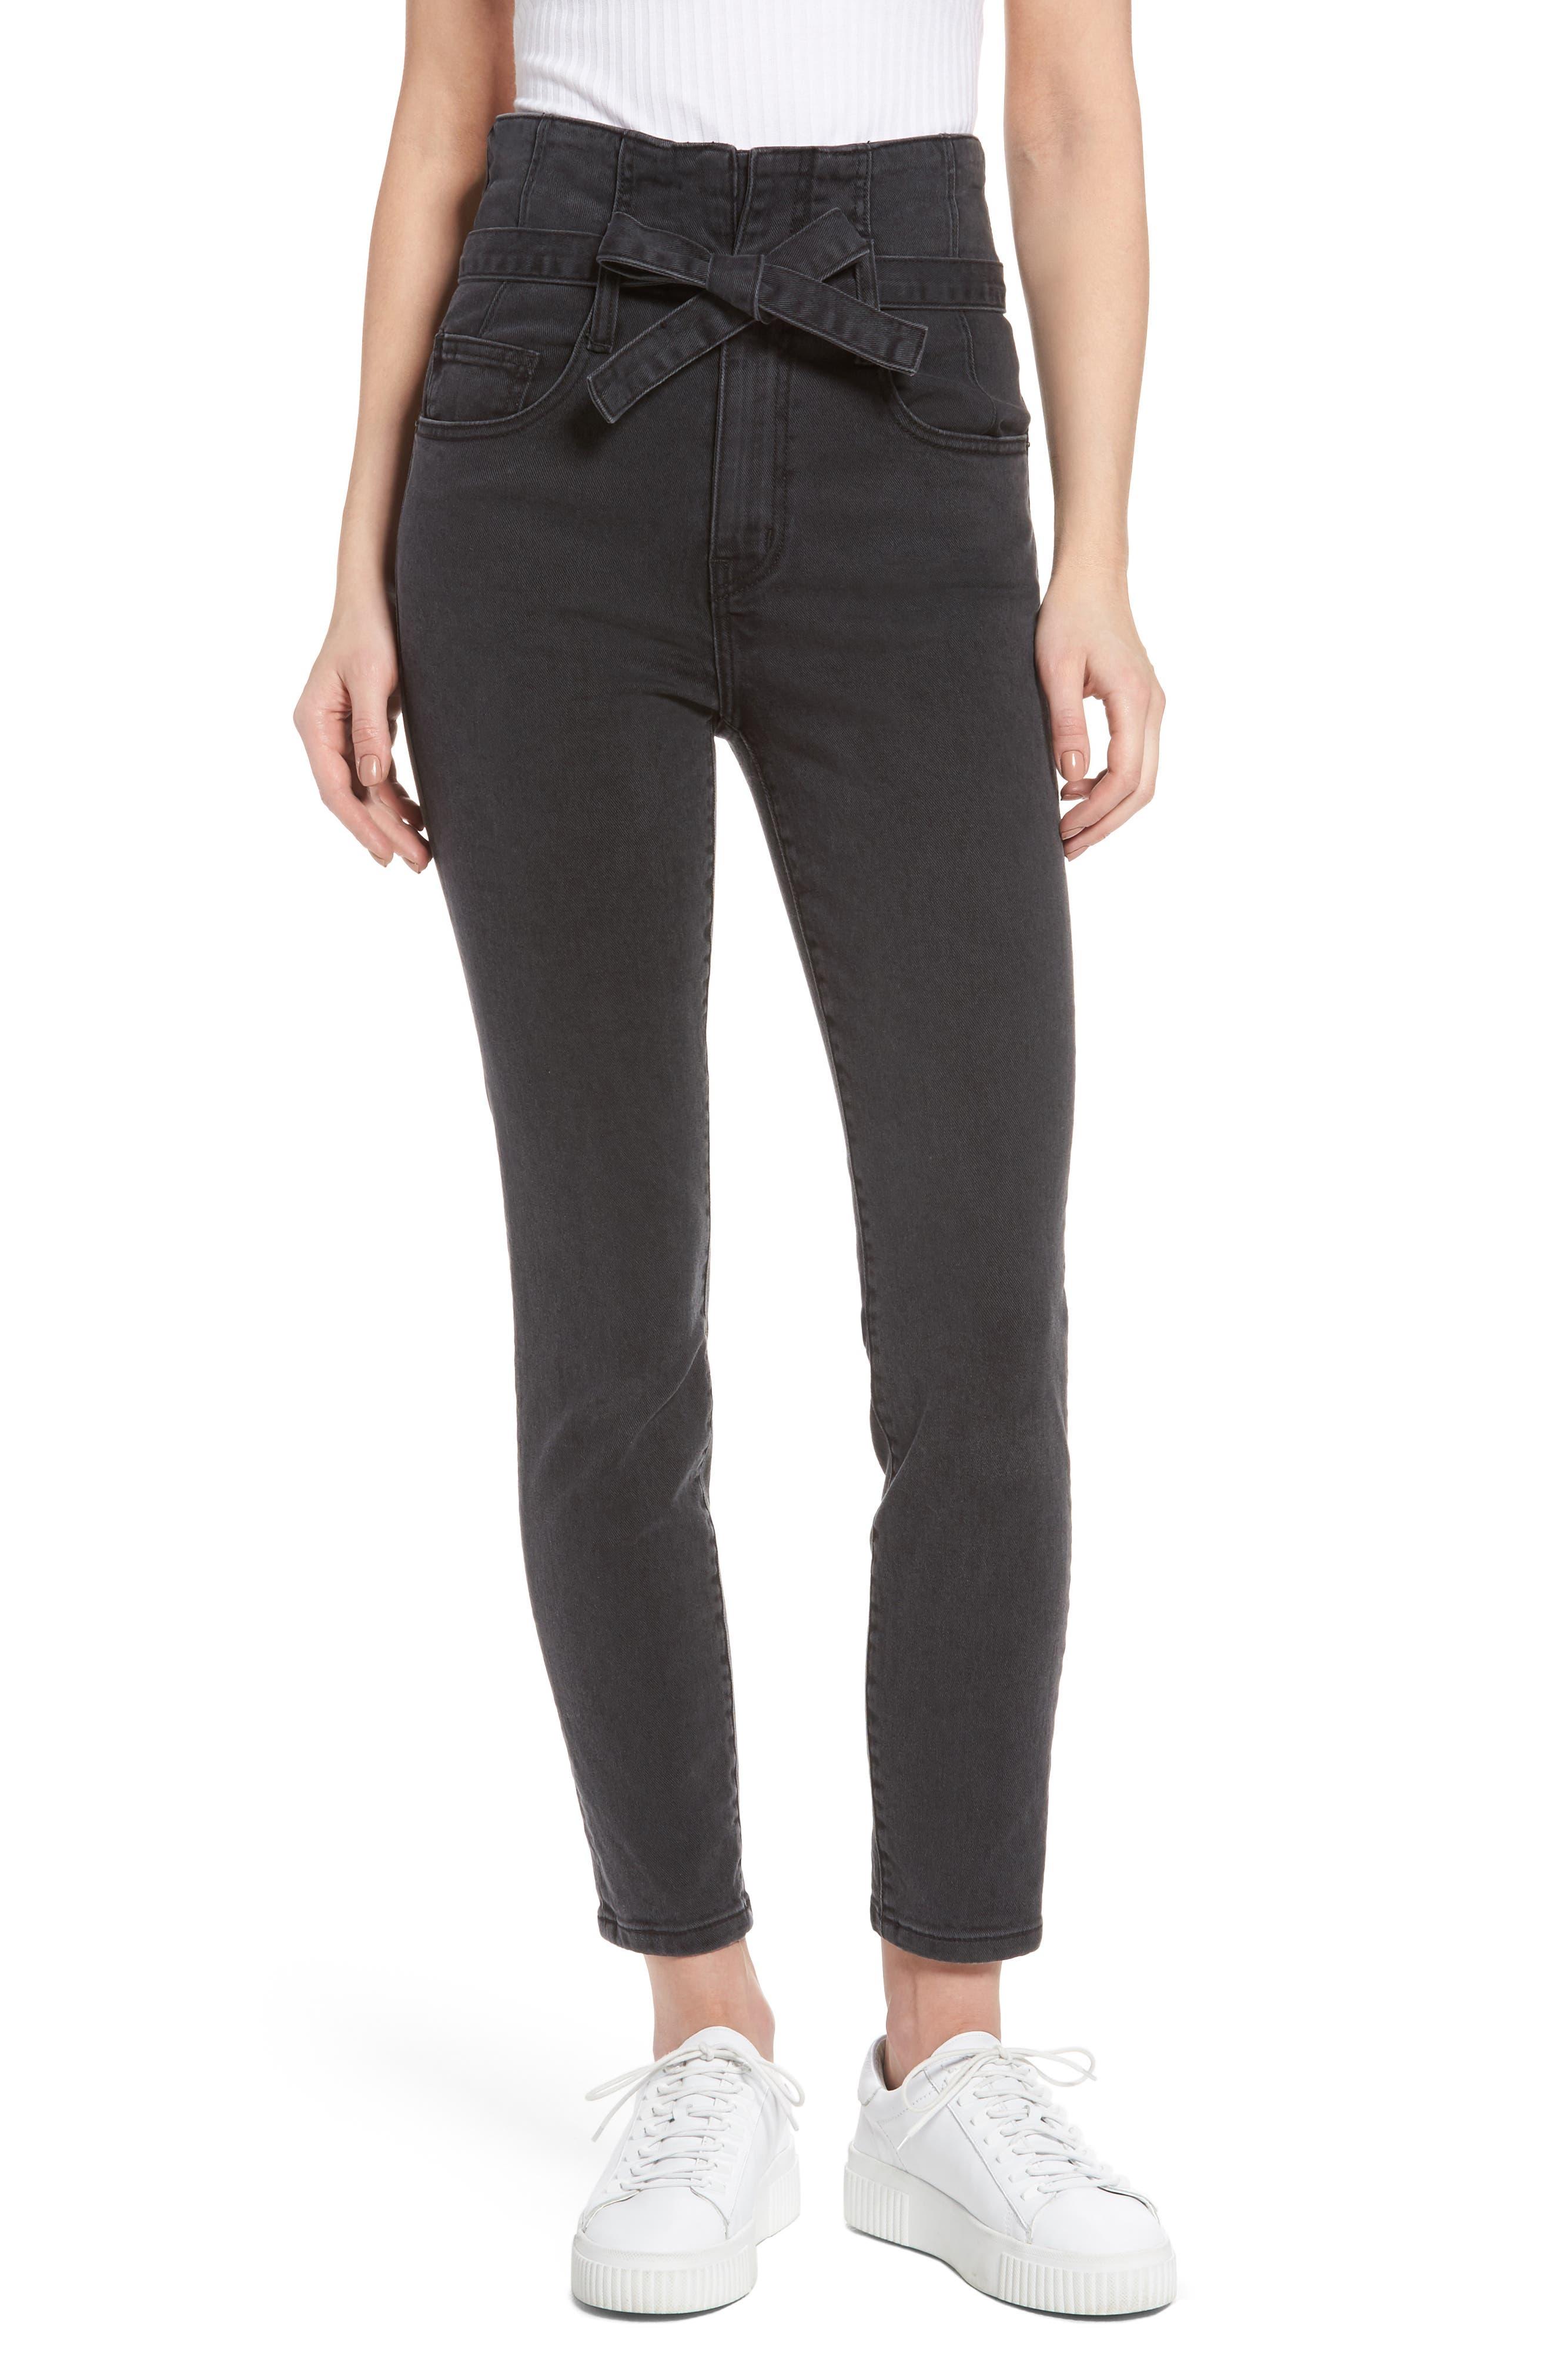 Current/Elliott Corset Stiletto Ankle Skinny Jeans (Indiana)